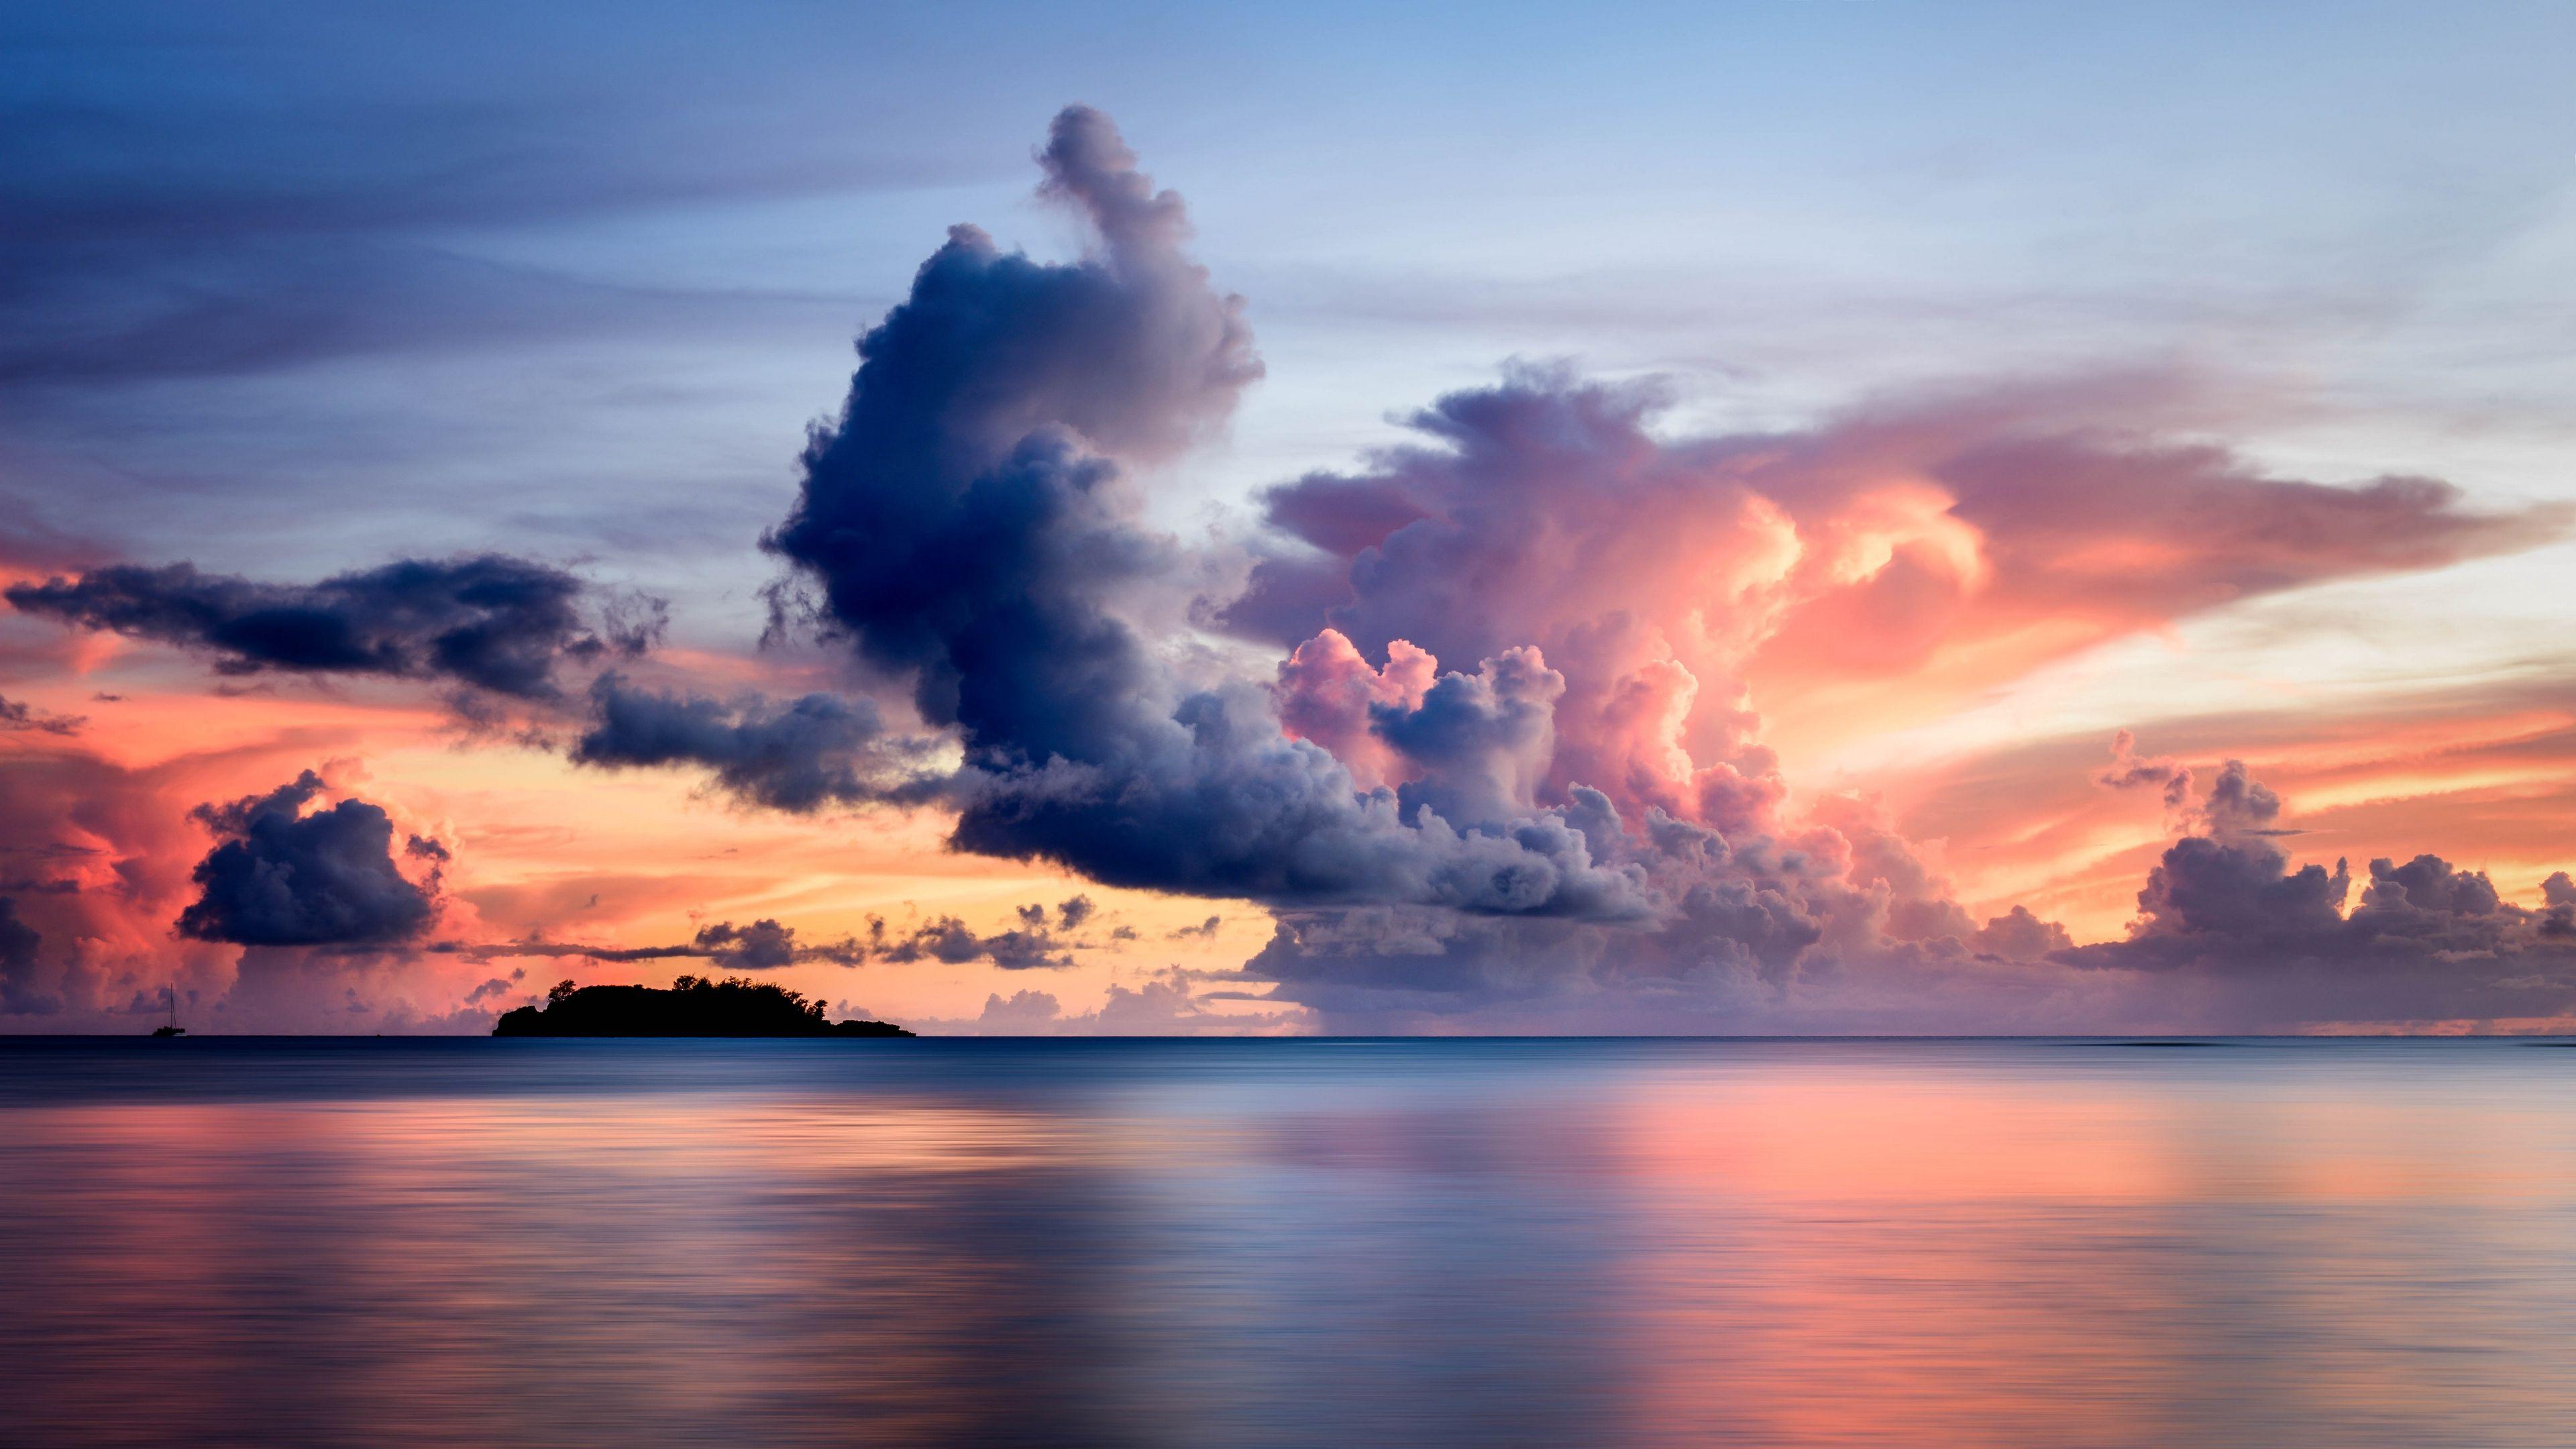 Sea Clouds Horizon Island Sky Sunset 4k Sea Horizon Clouds Cloud Wallpaper Clouds Nature Desktop Wallpaper